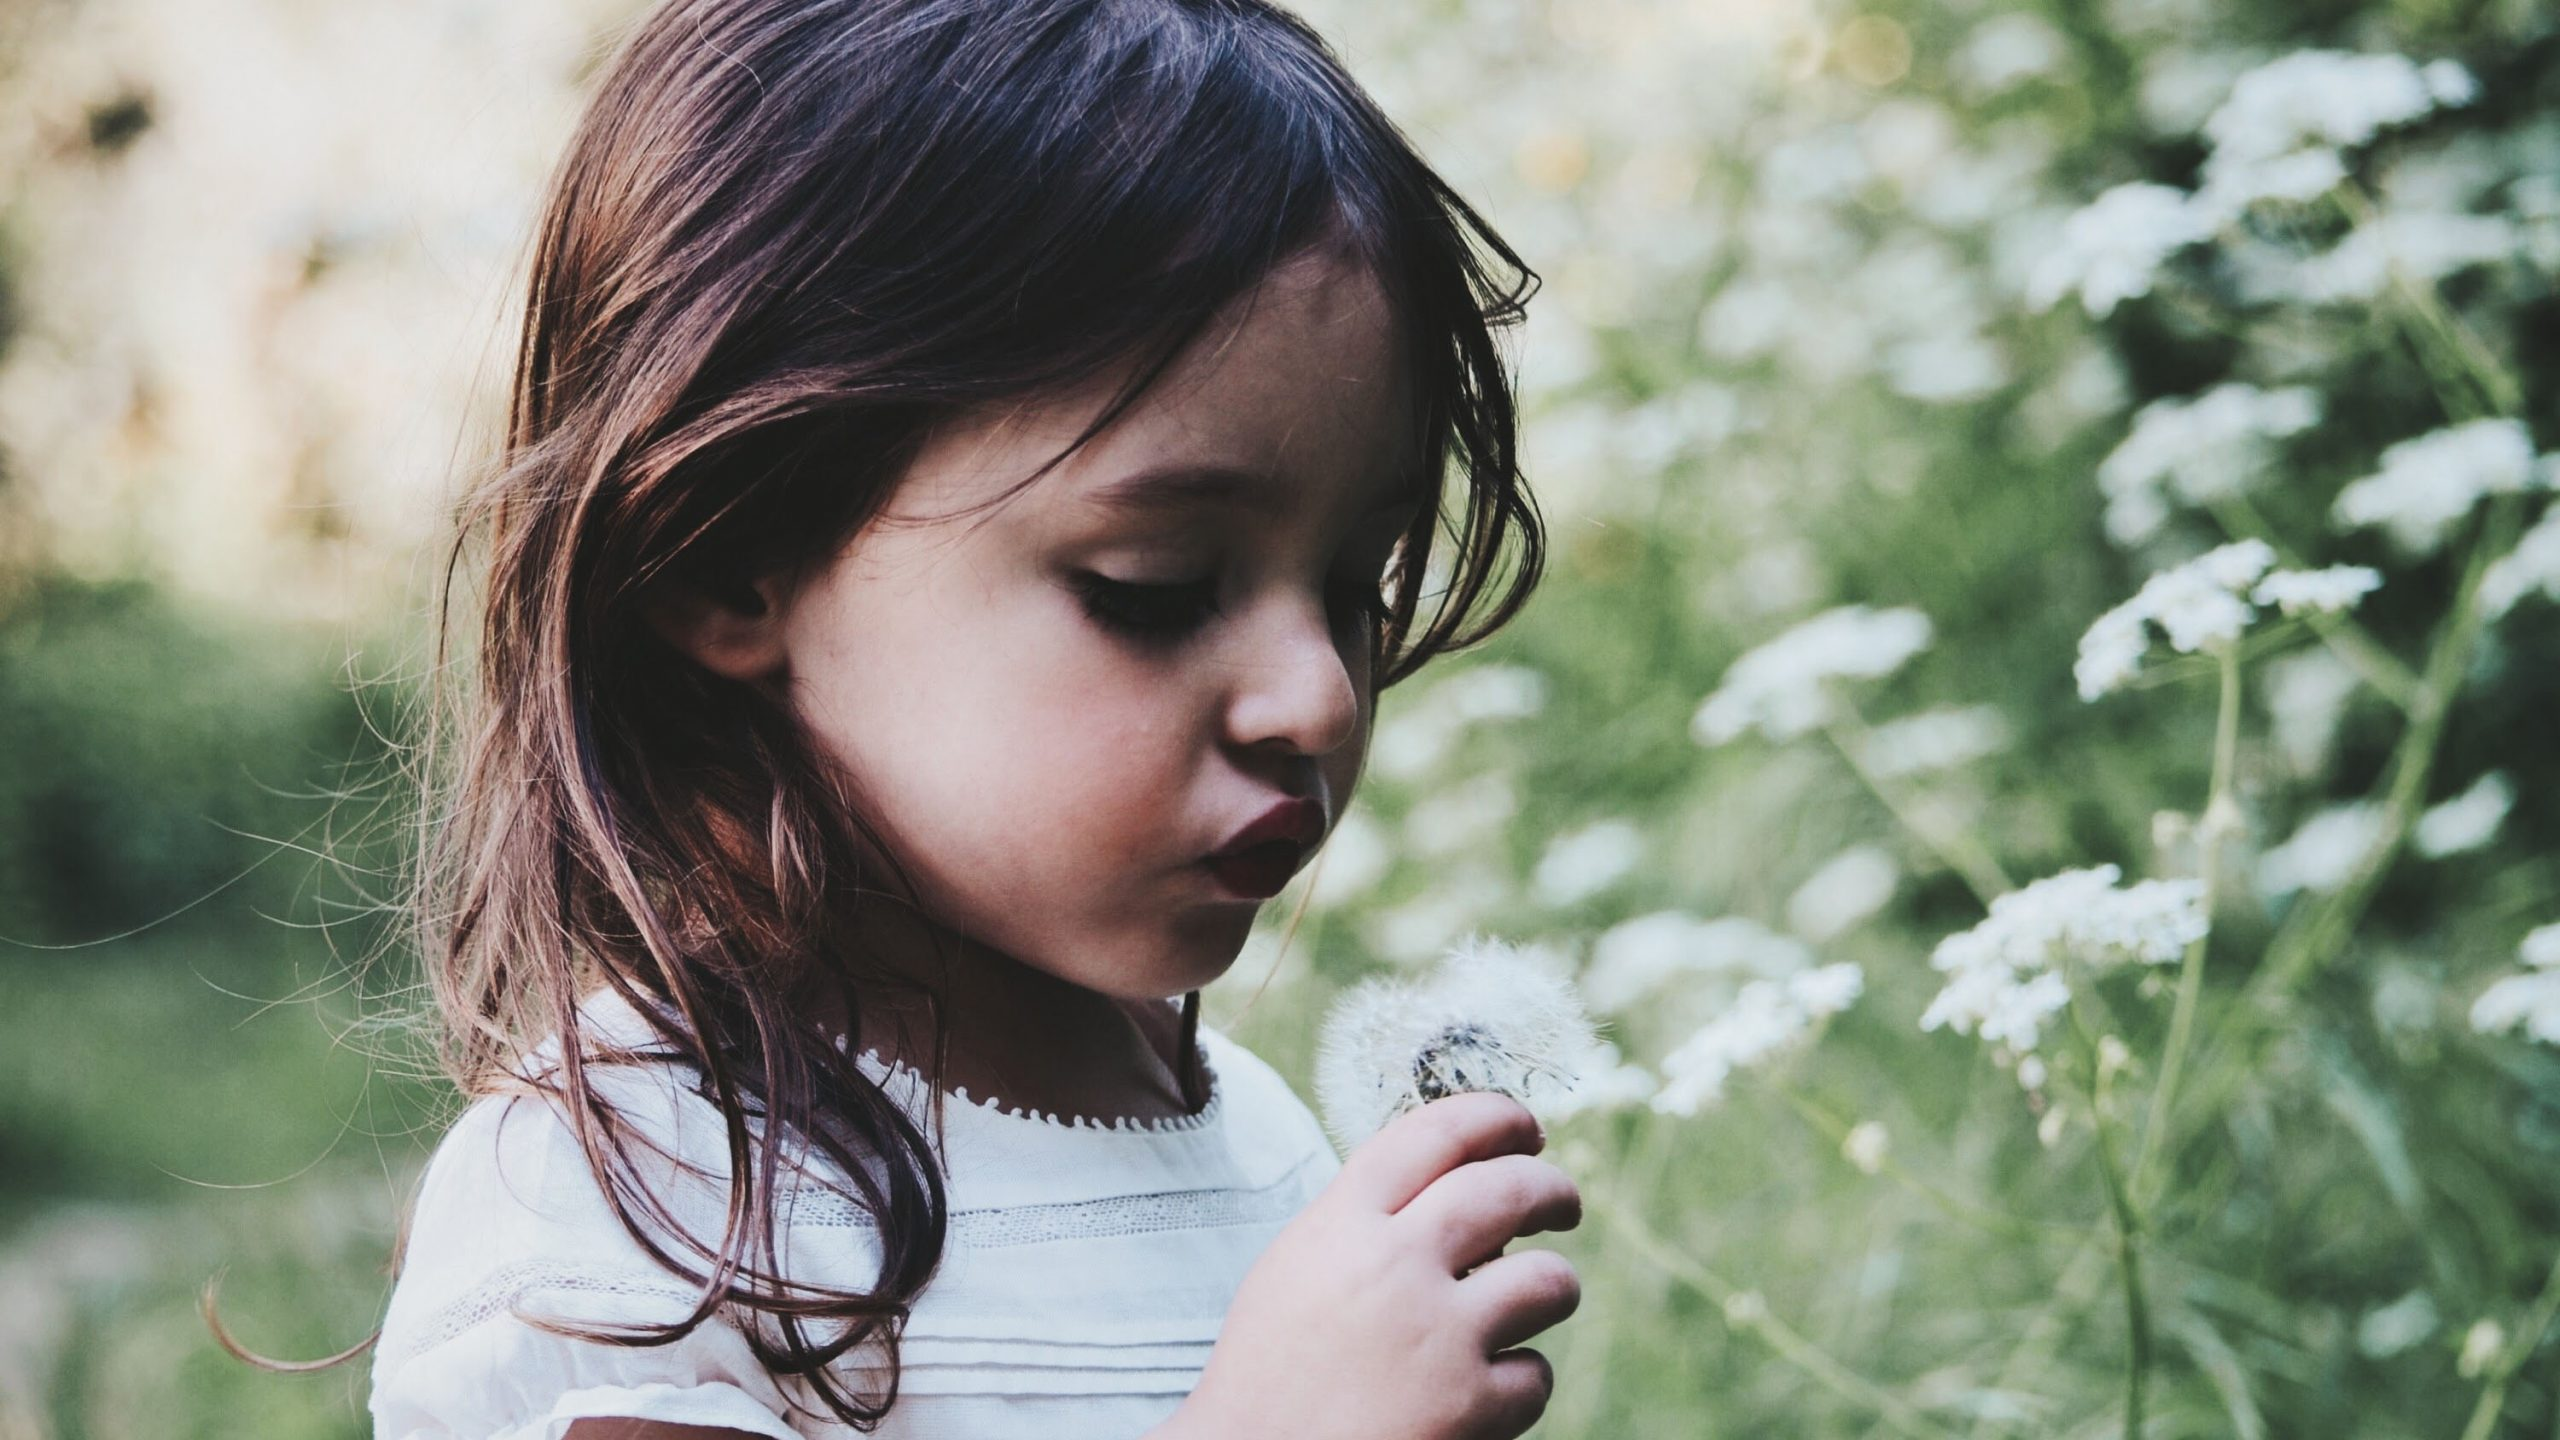 A child holding a dandelion